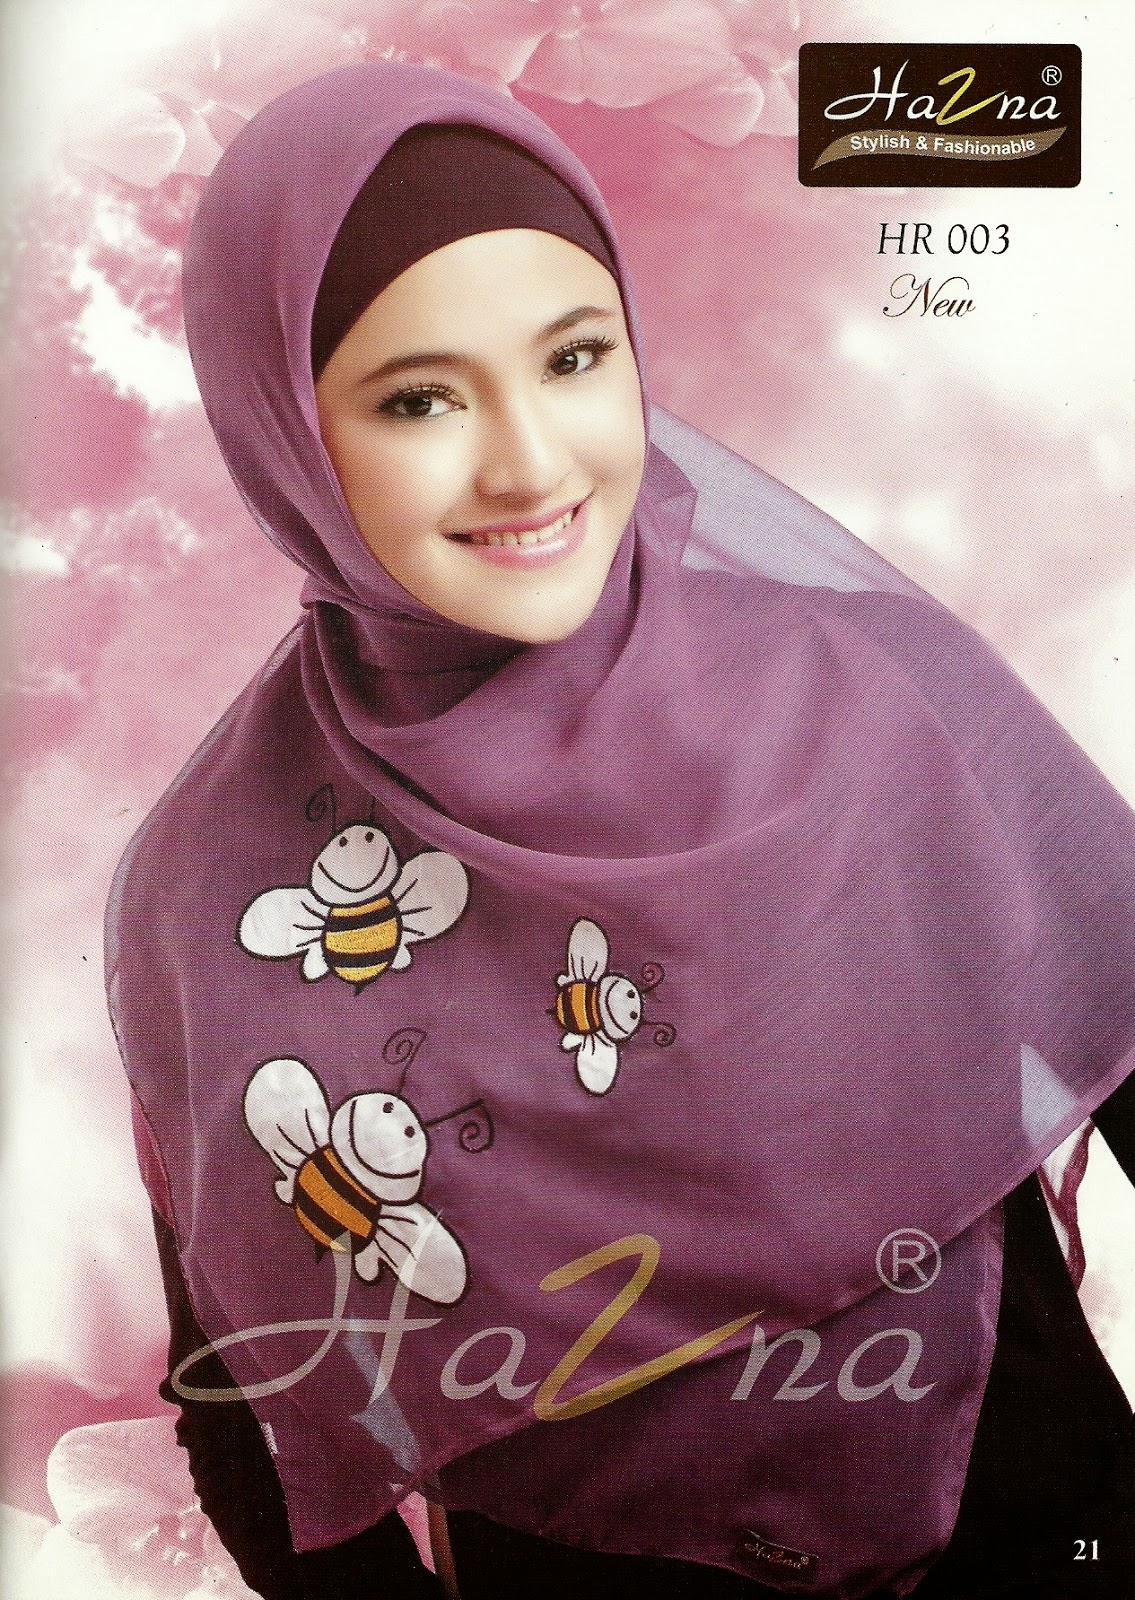 Foto Model Jilbab Cantik Jelita Artis Marshanda